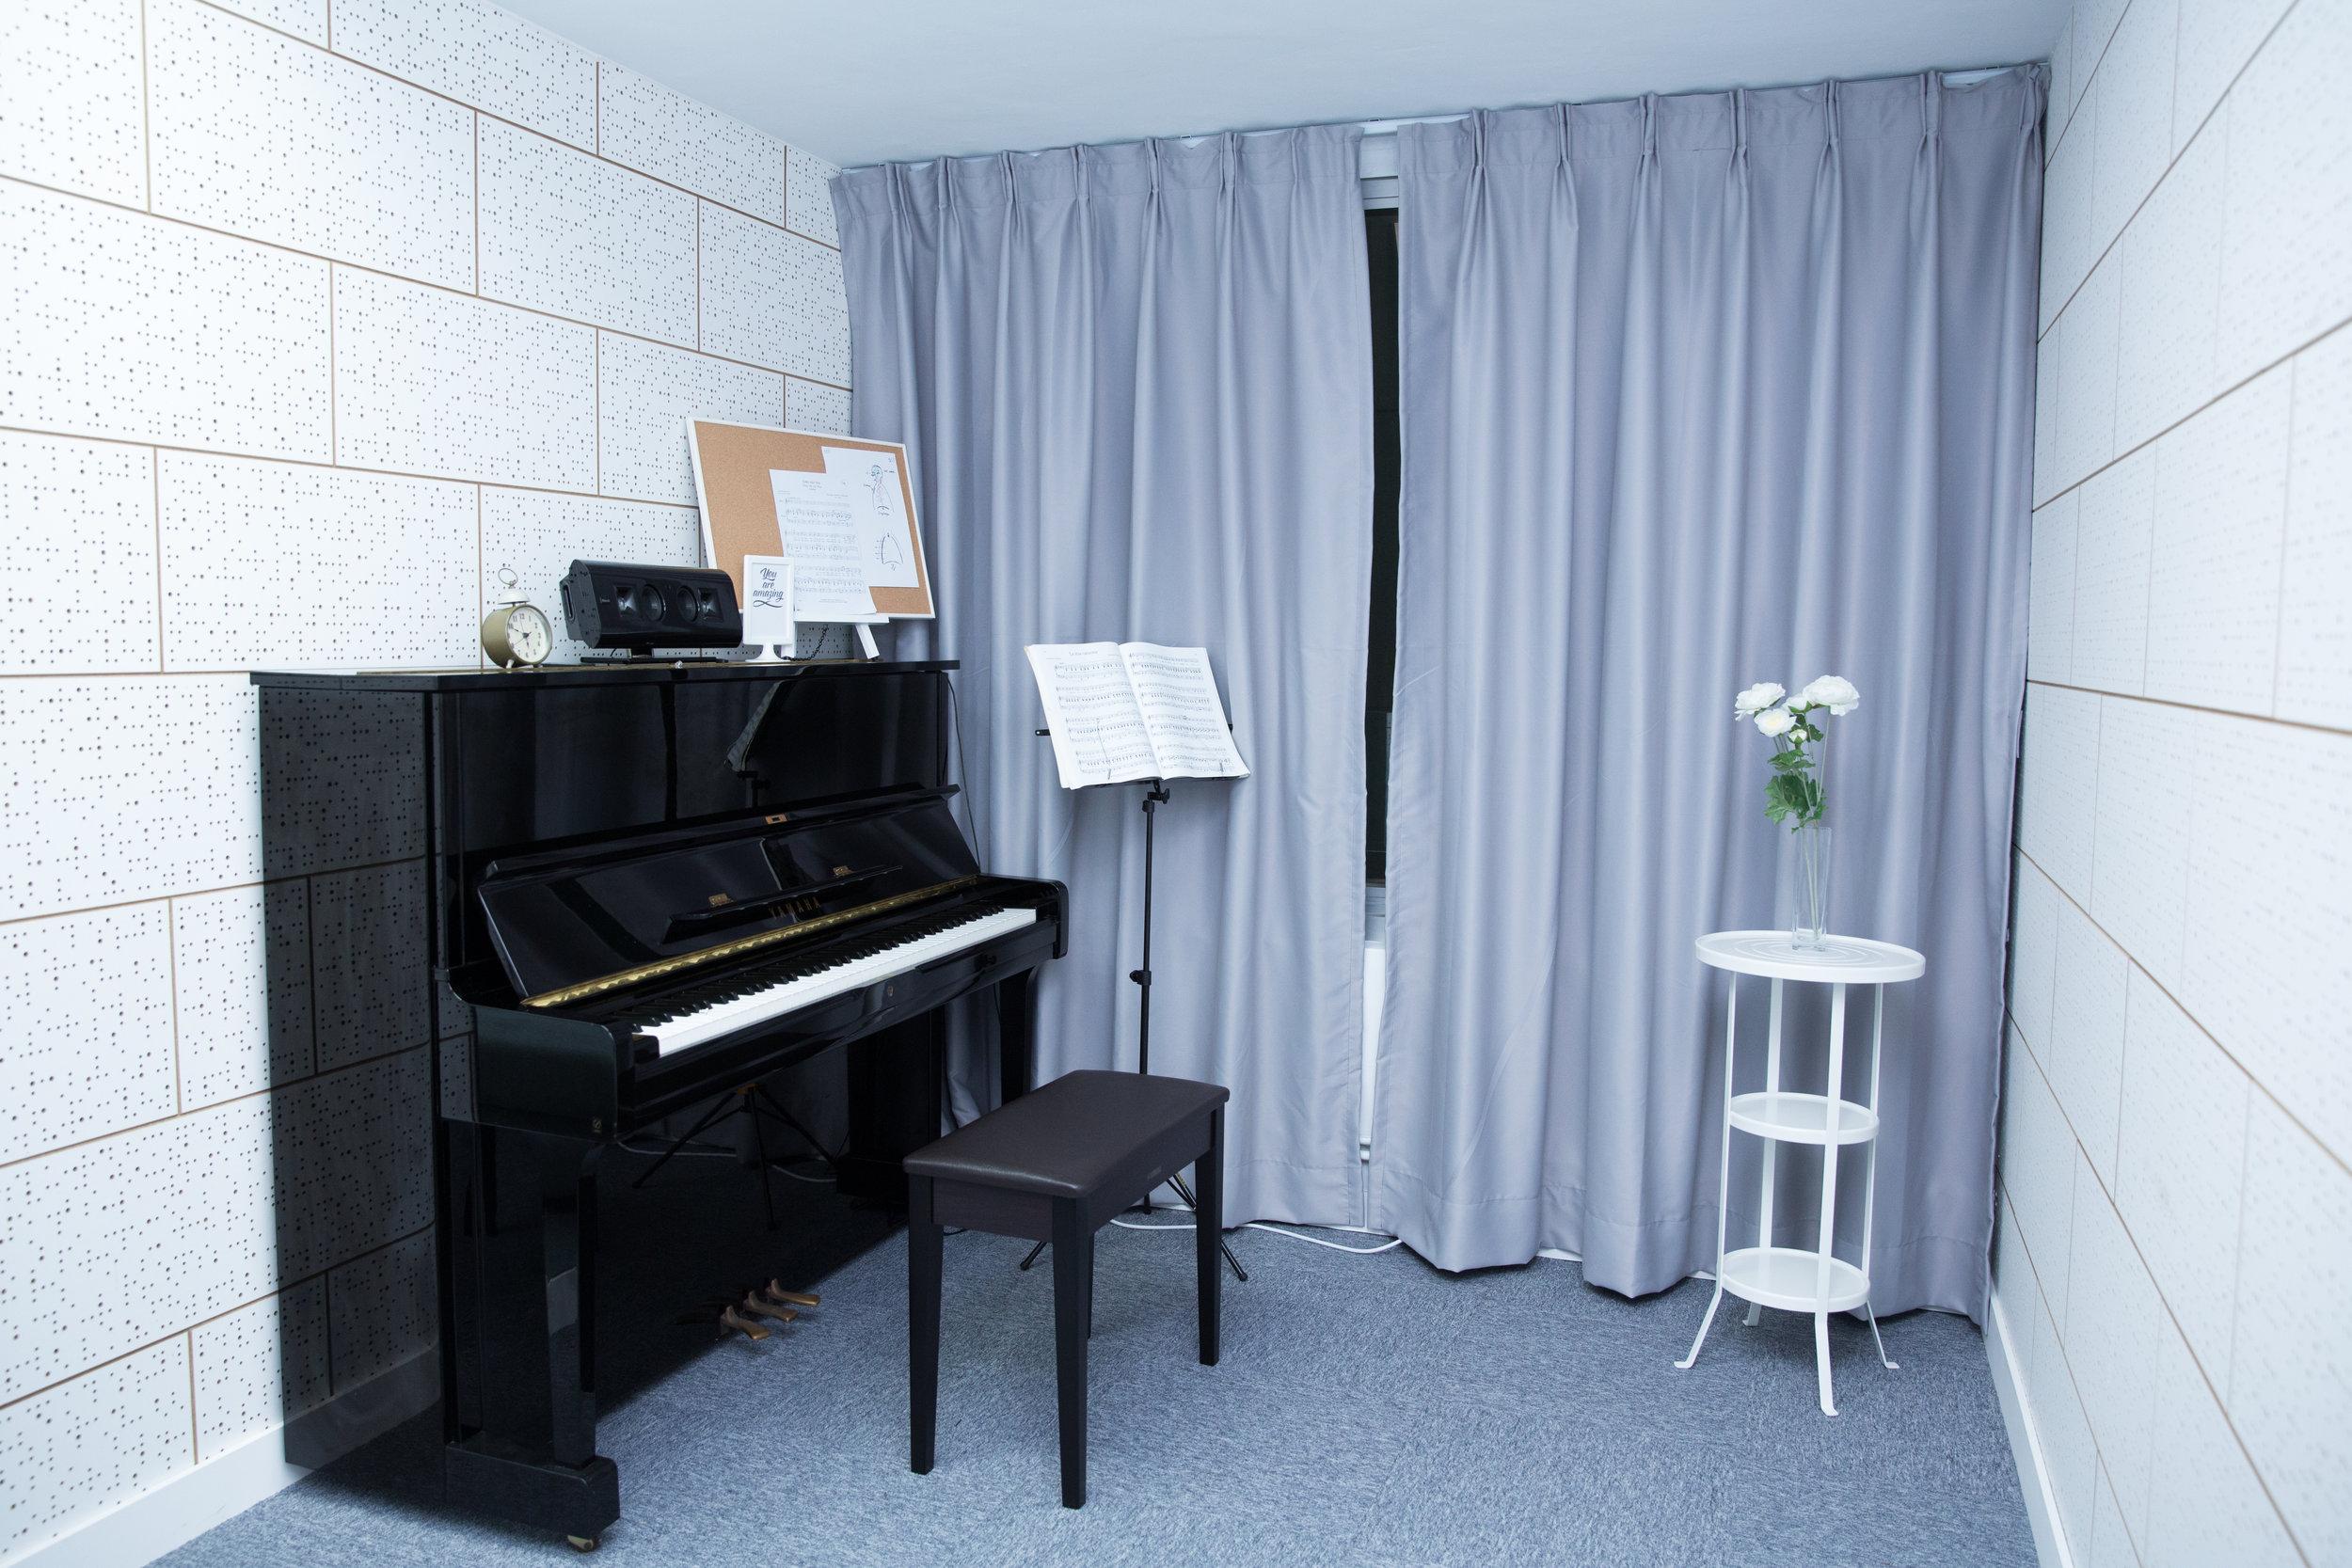 CLASSIC SINGING ROOM  主要作為古典聲樂個別教授課程  的教室,並使用YAMAHA直立  式鋼琴。另設有美國名廠  KLIPSCH的藍芽喇叭及蘋果  IPAD供教學使用。